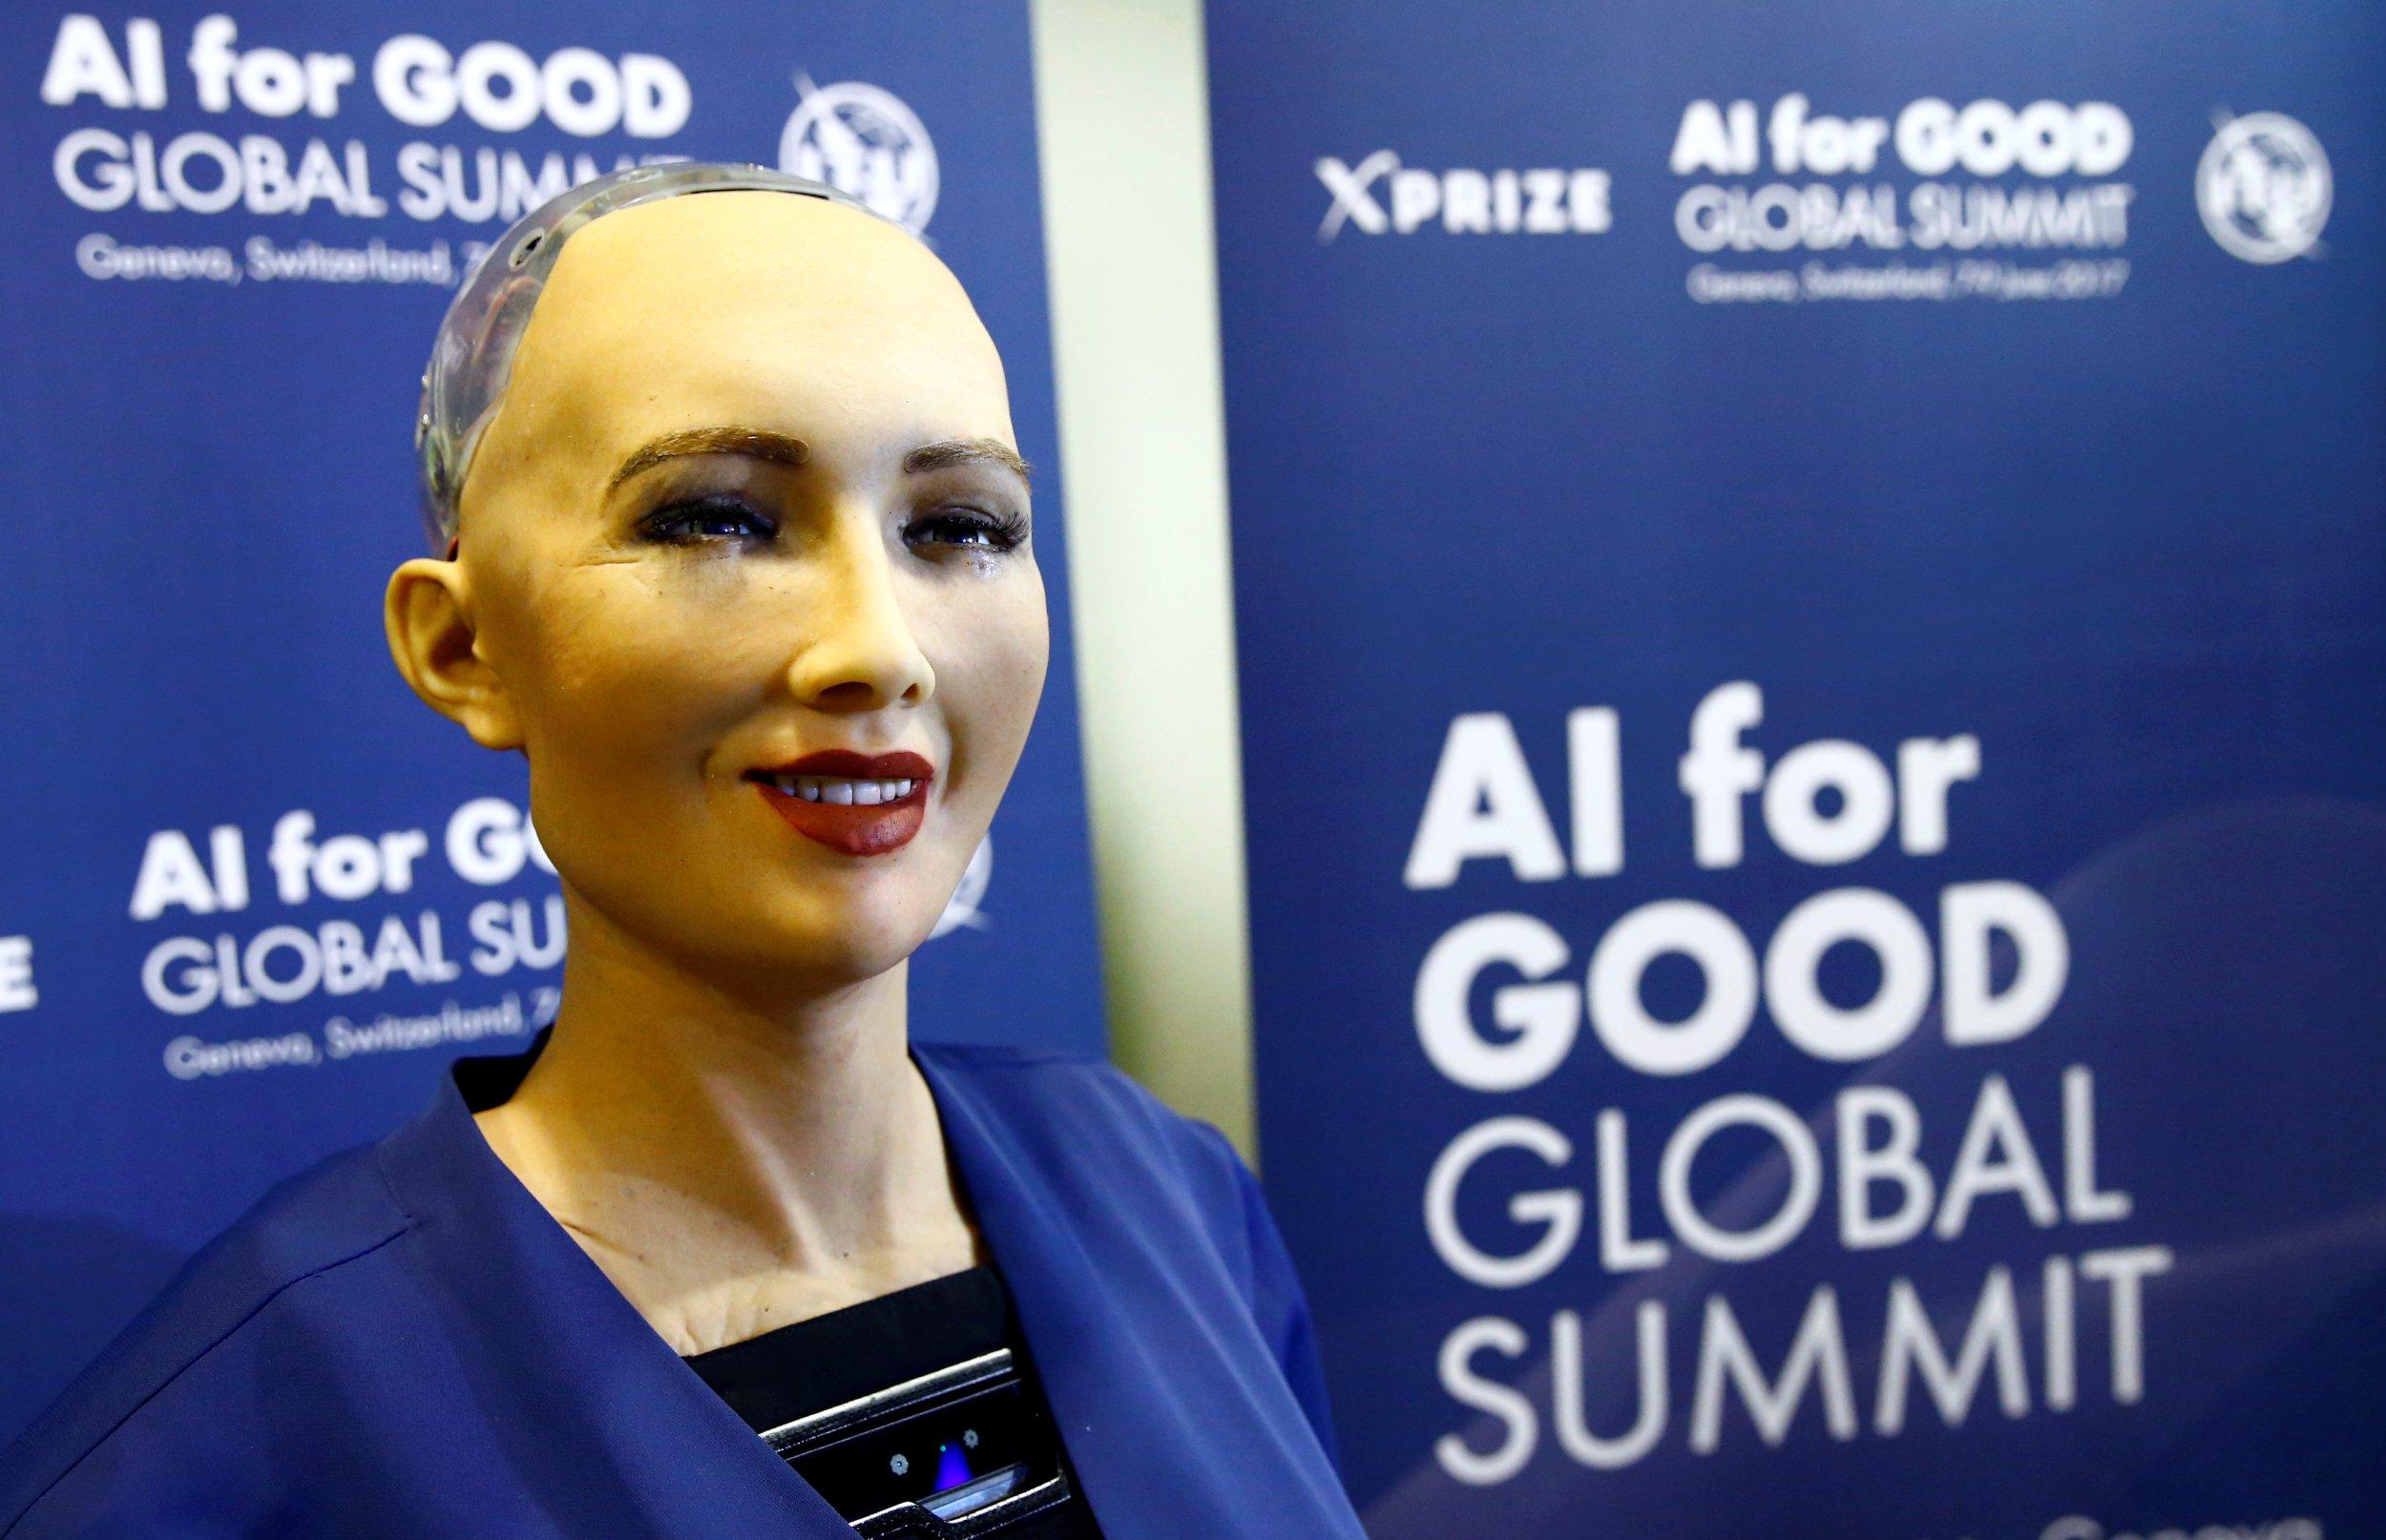 Sophia_robot